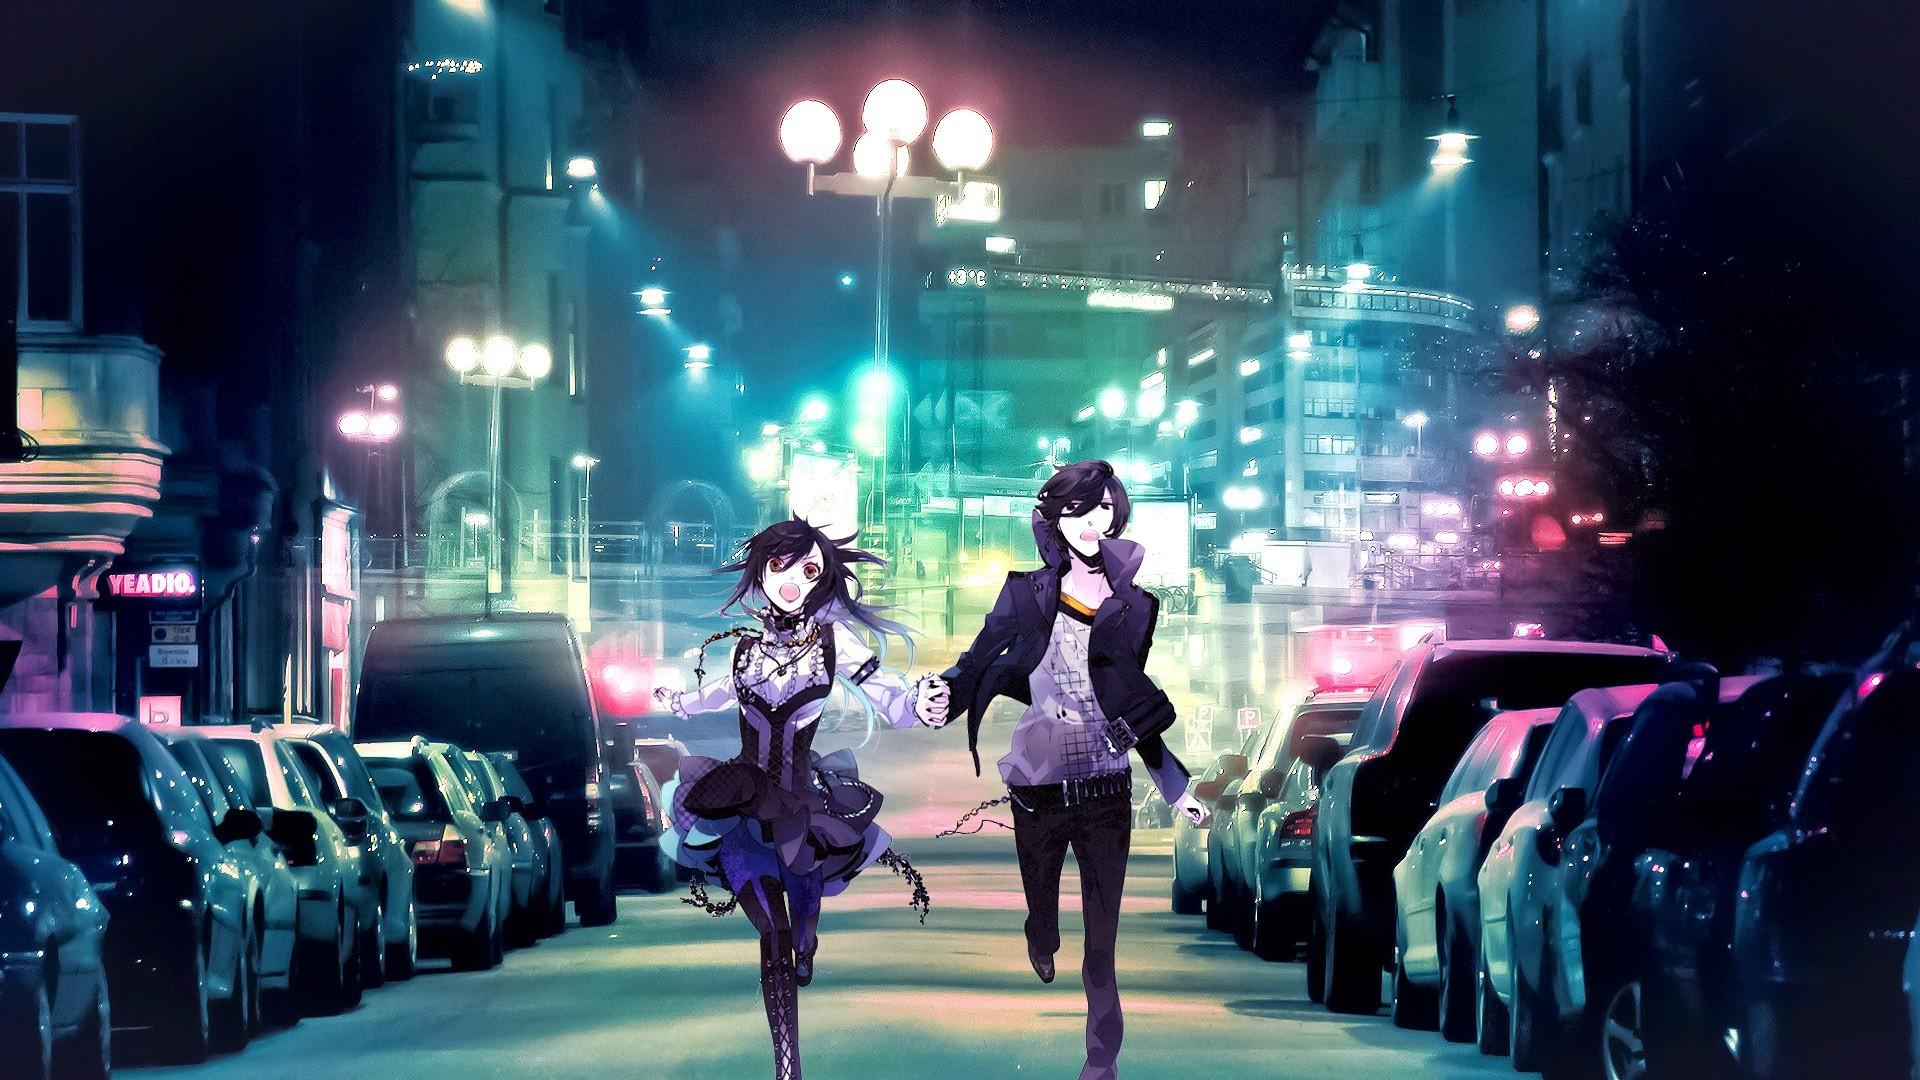 Cute Couple Anime Wallpaper #16503 Wallpaper | High Resolution